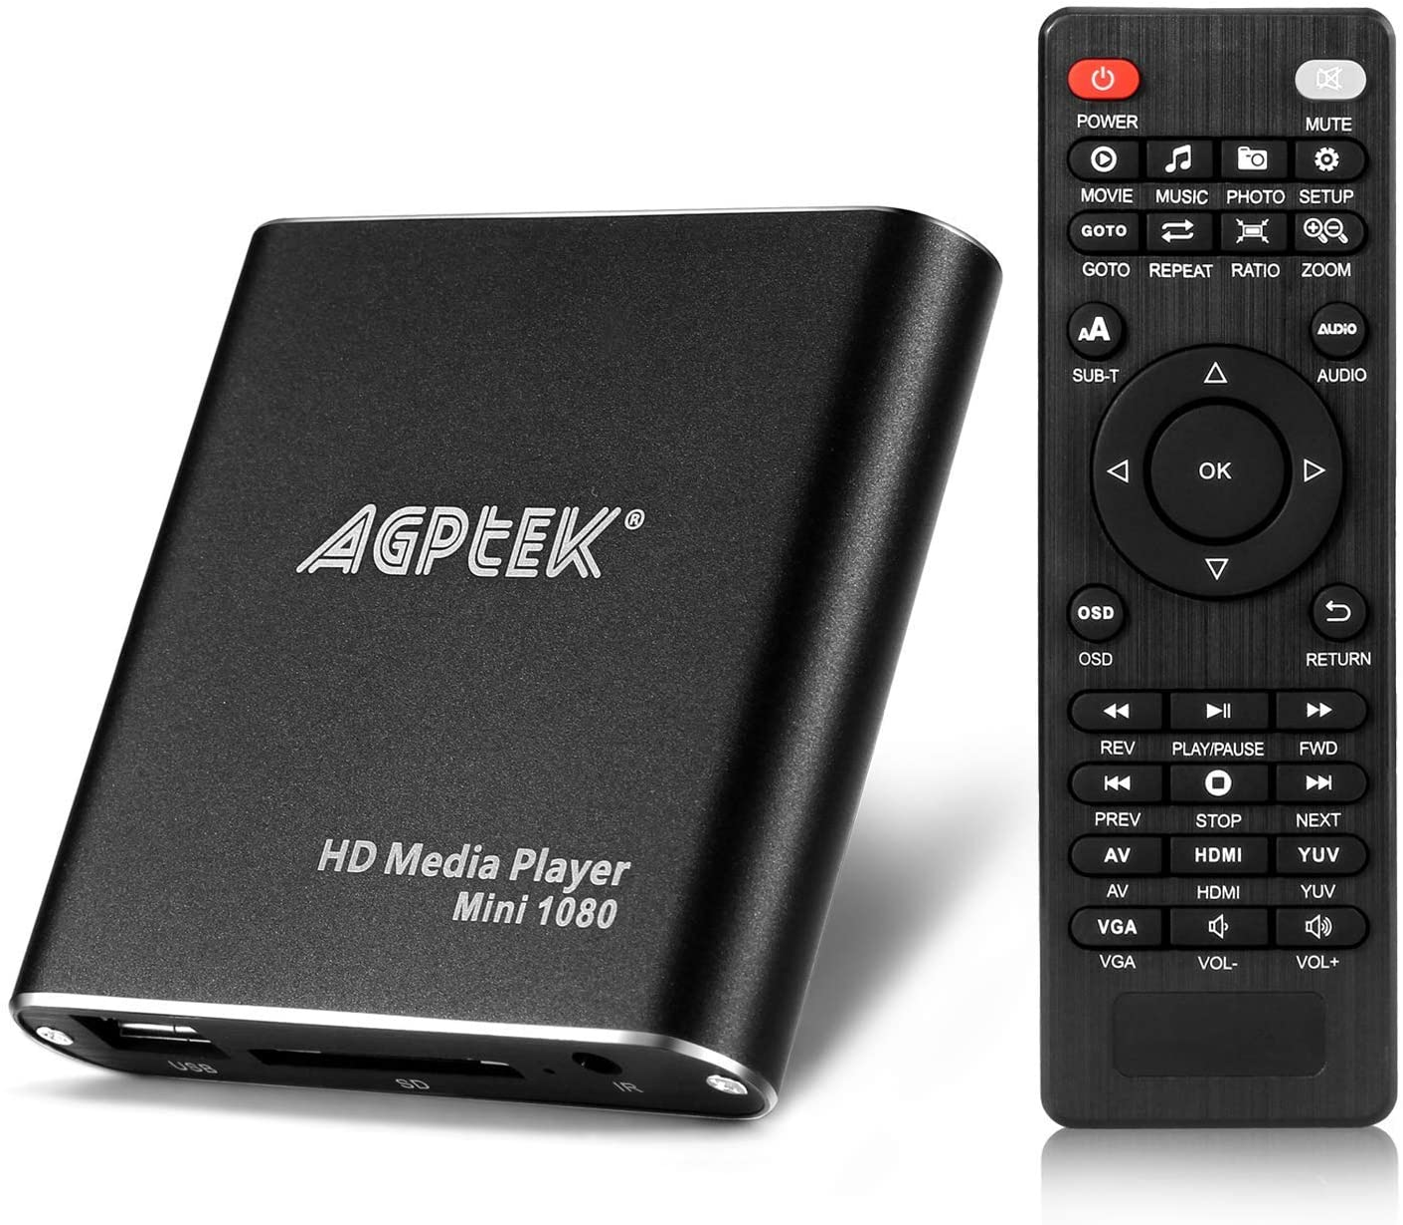 HDMI Media Player, Black Mini 1080p Full-HD Ultra HDMI Digital Media Player for -MKV/RM- HDD USB Drives and SD Cards